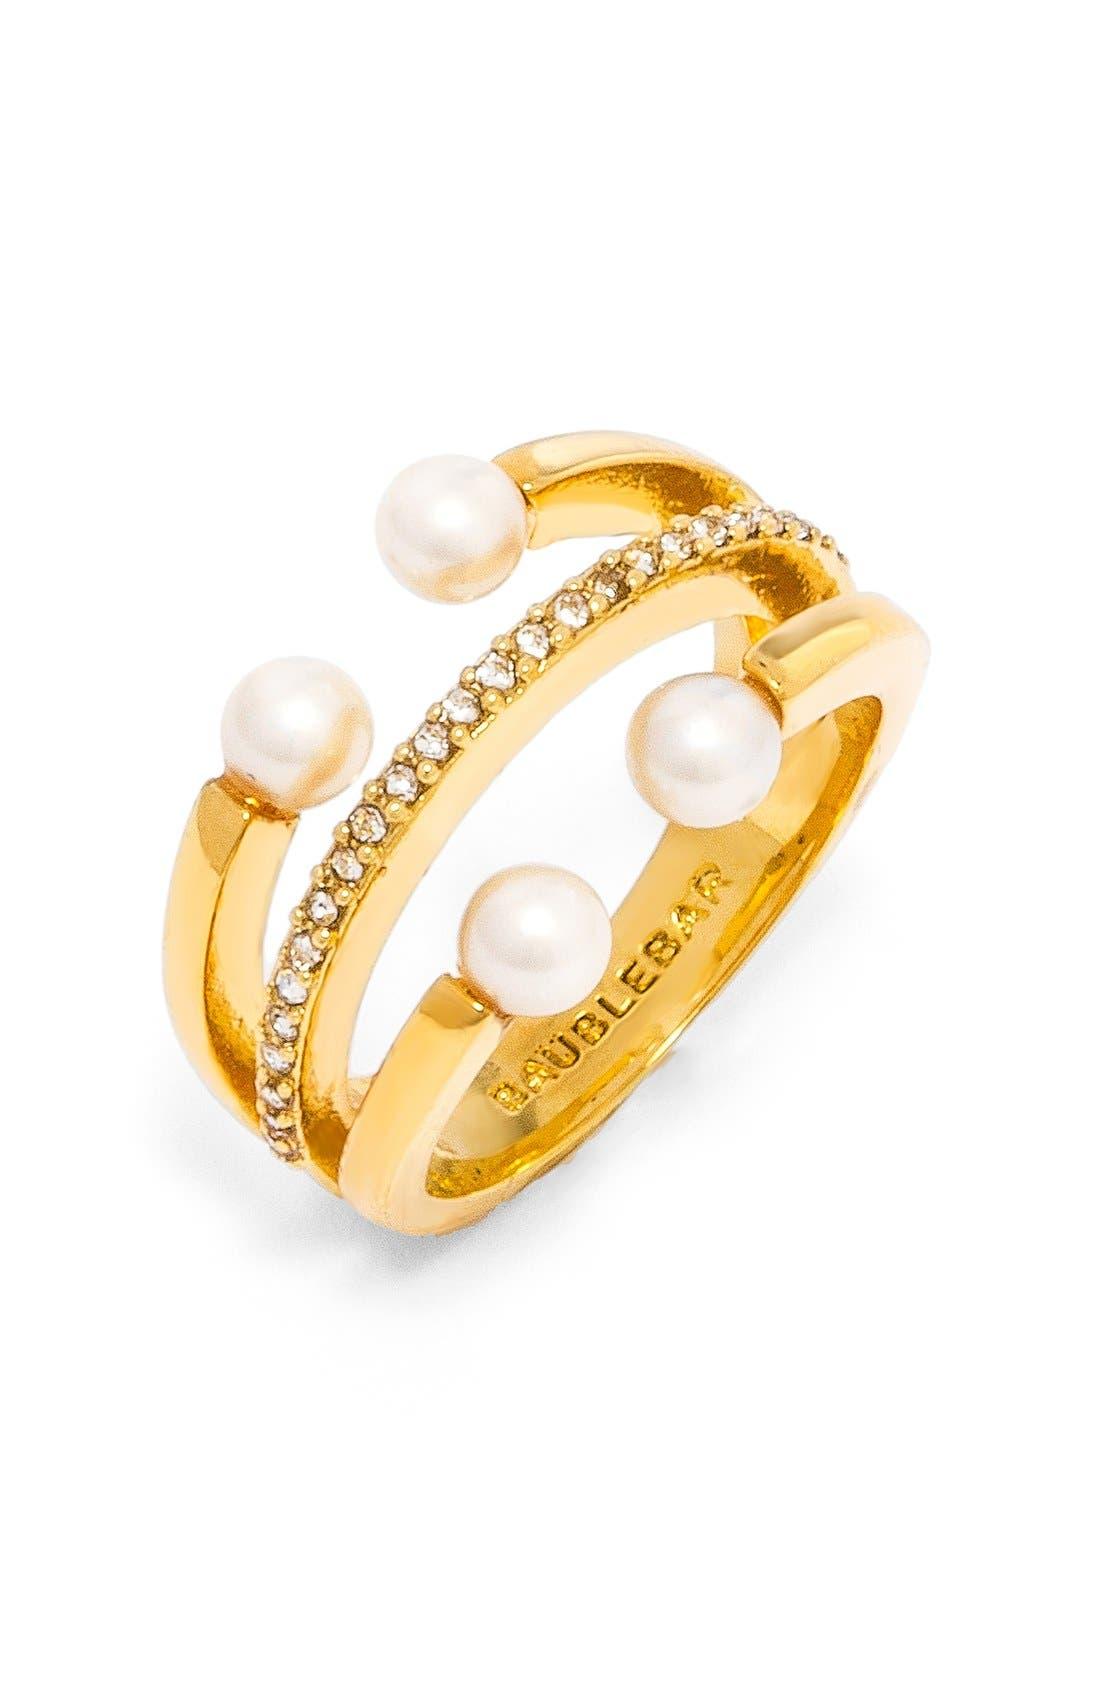 Alternate Image 1 Selected - BaubleBar 'Mag' Ring